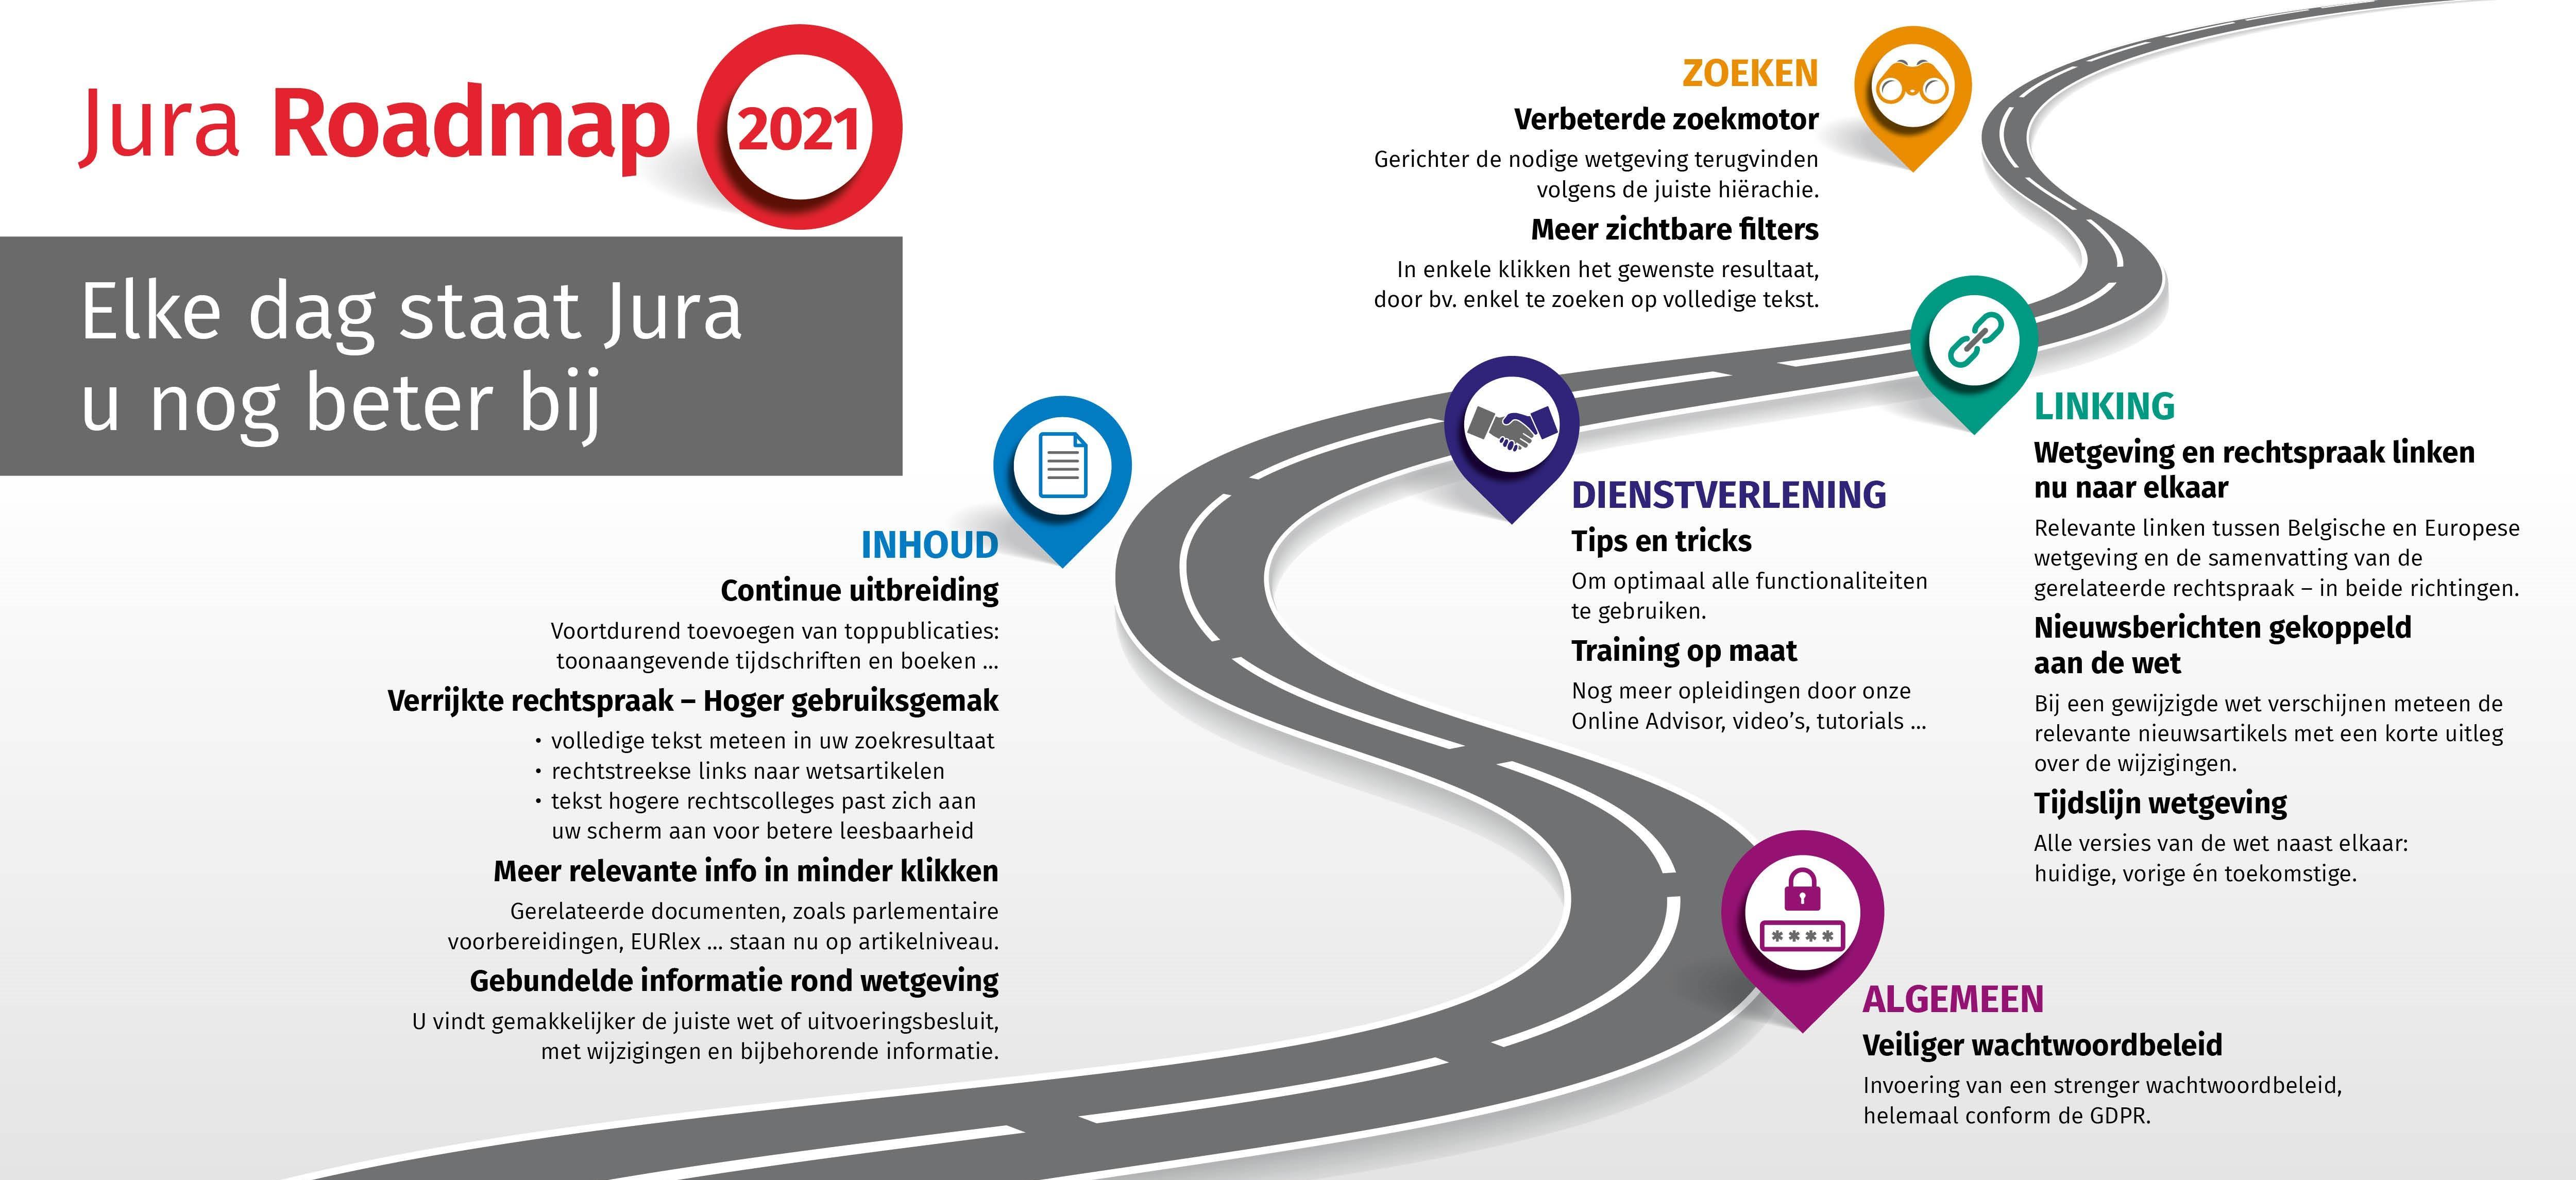 jura roadmap 2021